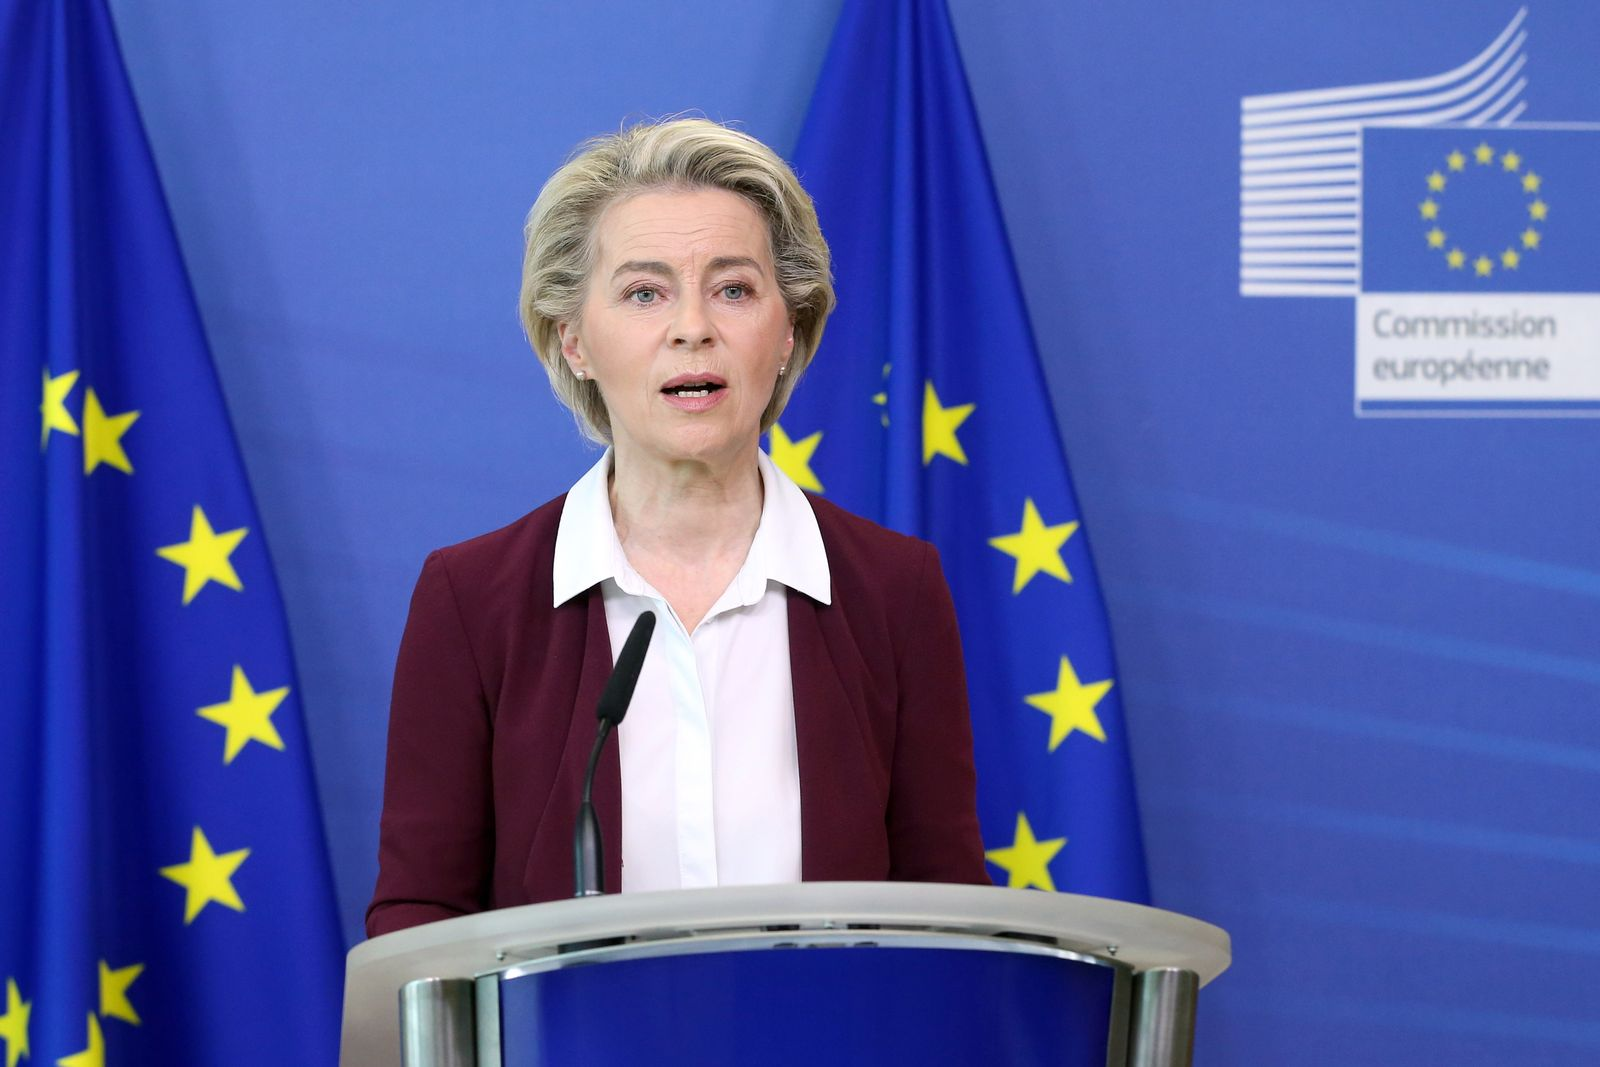 European Commission President Von der Leyen's press conference on COVID-19 vaccine